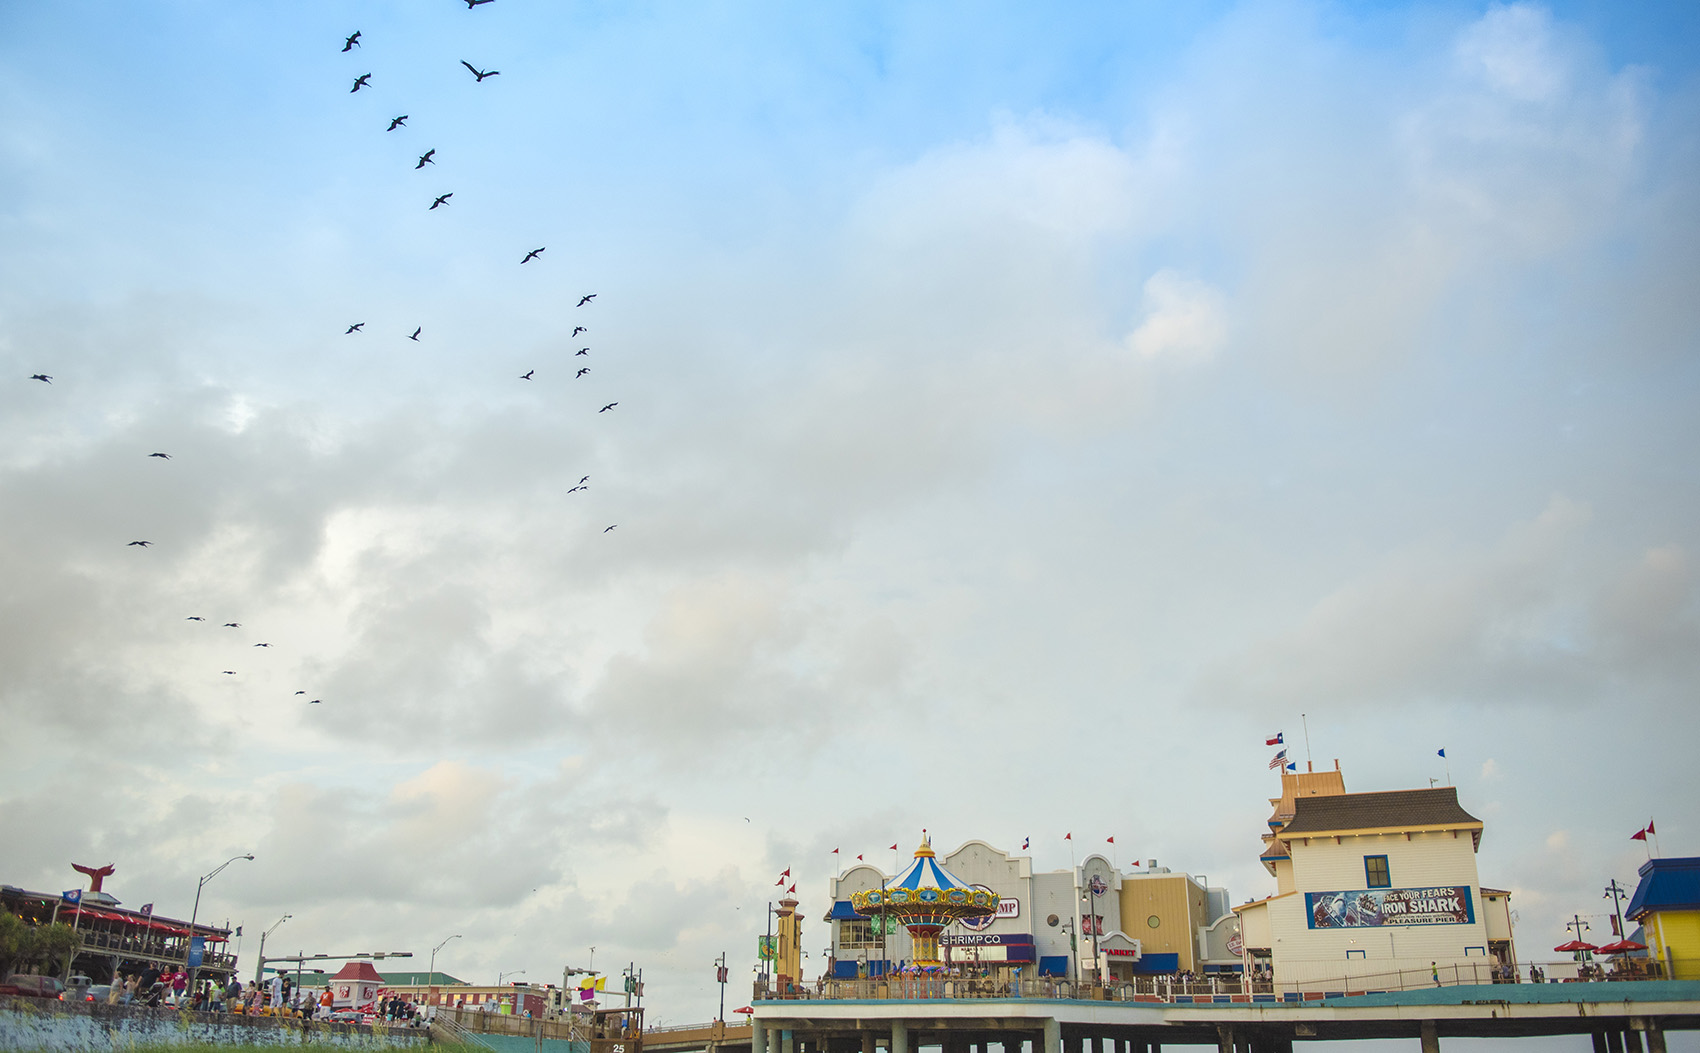 Houston-galveston-beach-pleasure-pier-engagement-Gavie_Jamie_052sm.jpg